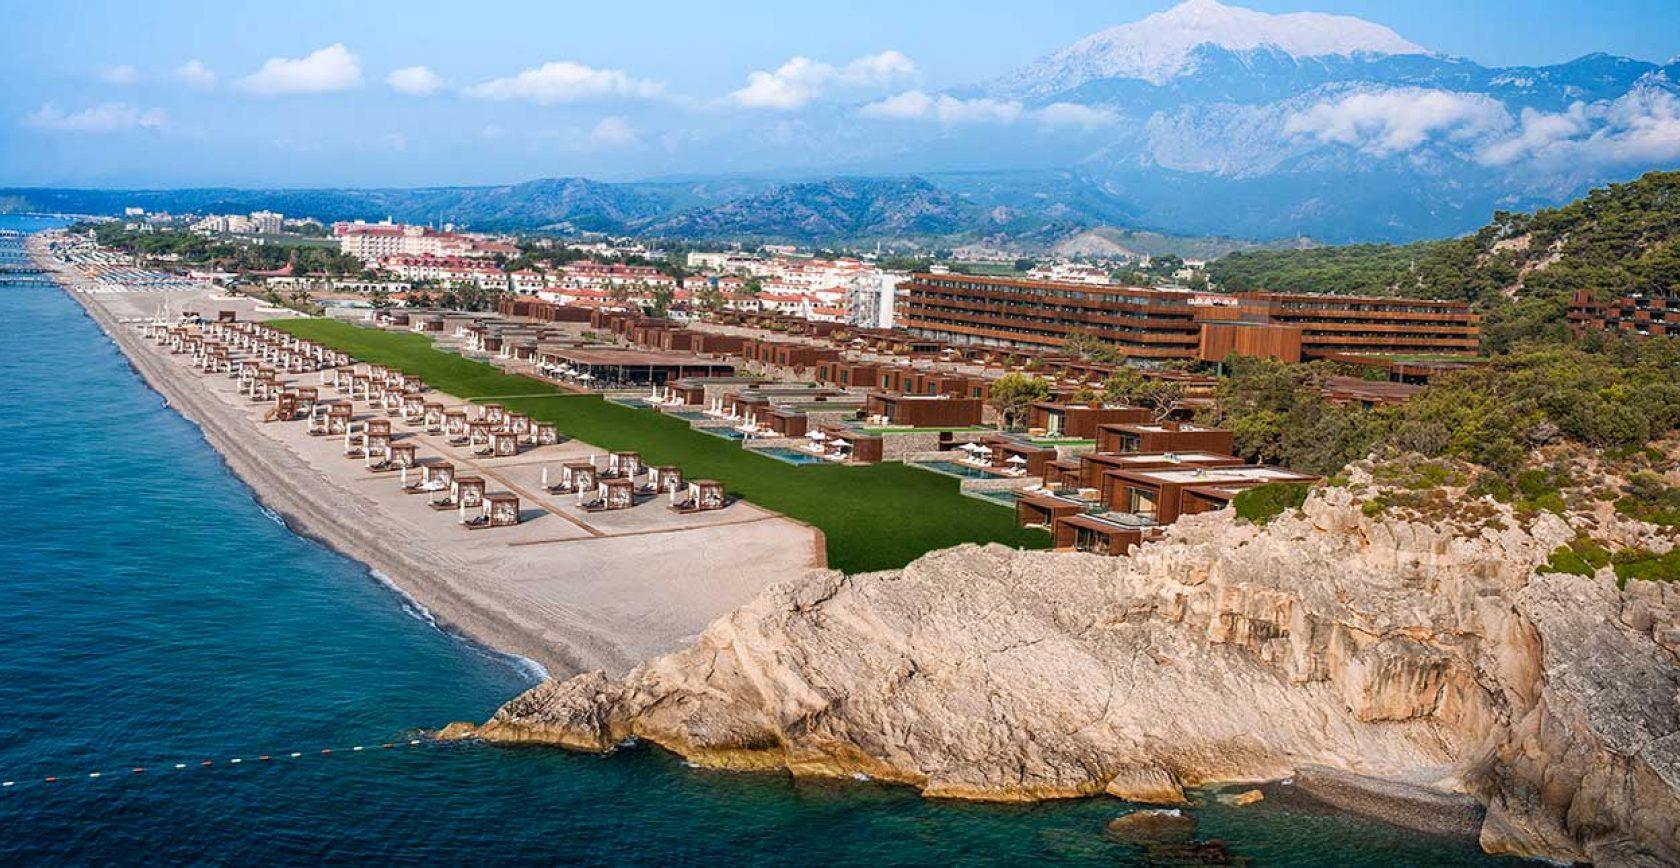 hoteluri Kemer, hotele Kemer, odihna Turcia, hoteluri ieftin Turcia, Kemer oferte